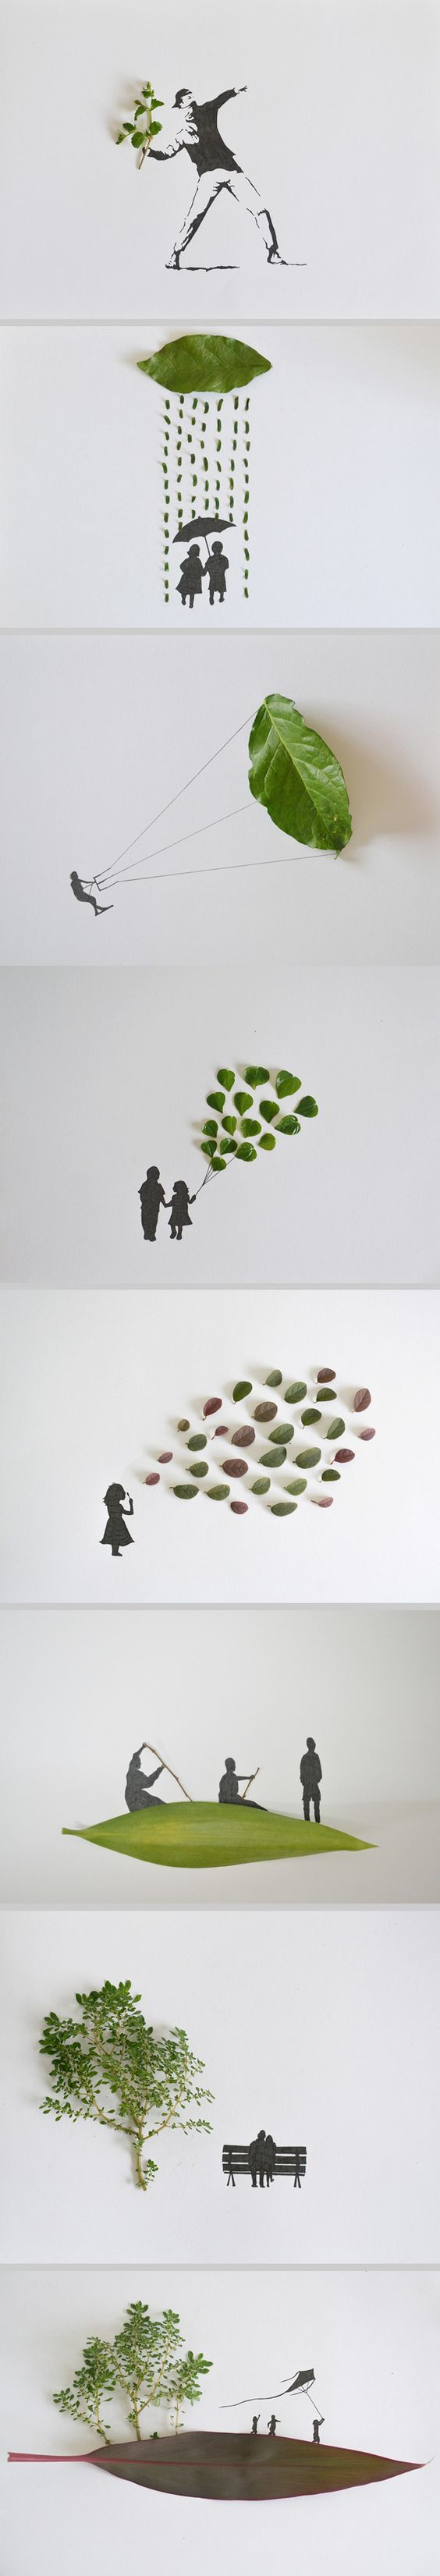 Object Art by Tang Chiew Ling  http://www.behance.net/gallery/Personal-Projects-Object-Art-1/9093247 #Art #ObjectArt